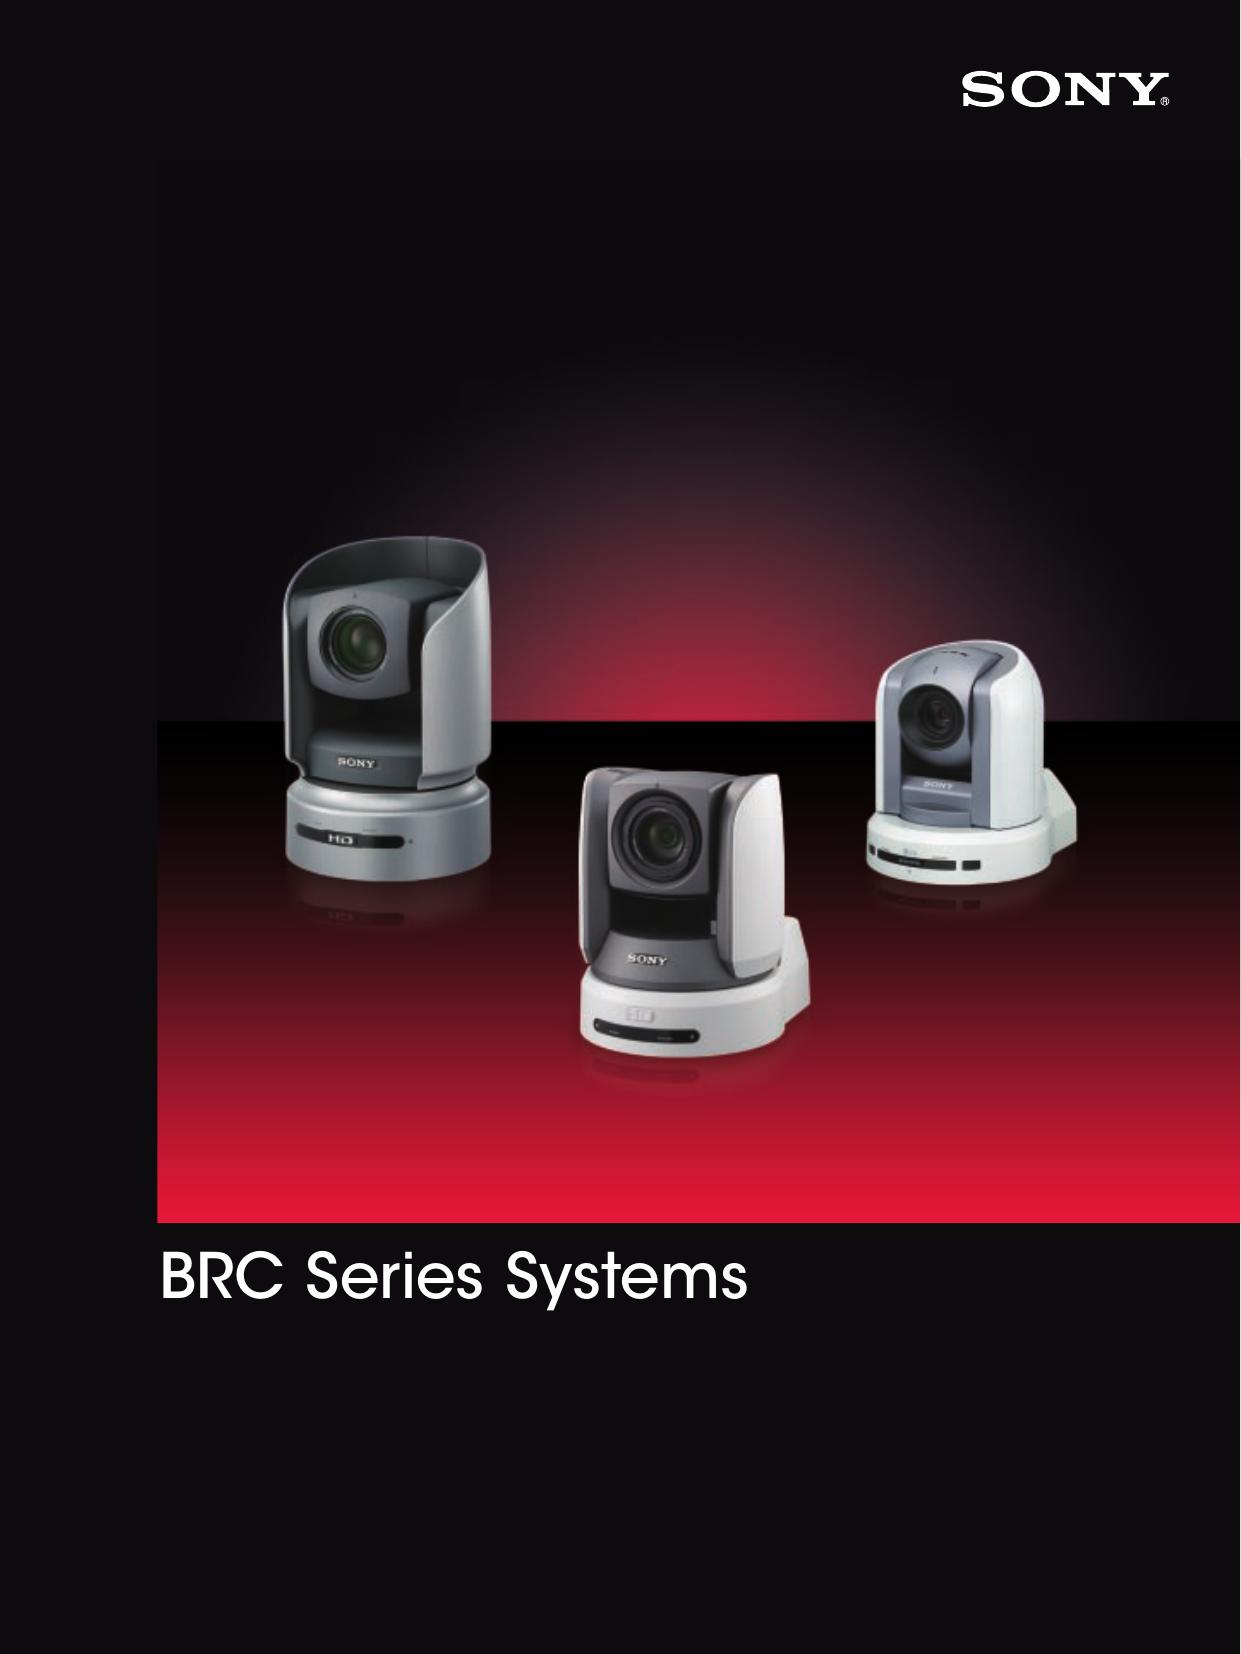 SONY BRU-300 Optical Multiplex Unit With BRBK-302 SDI Module For BRC-300 Camera